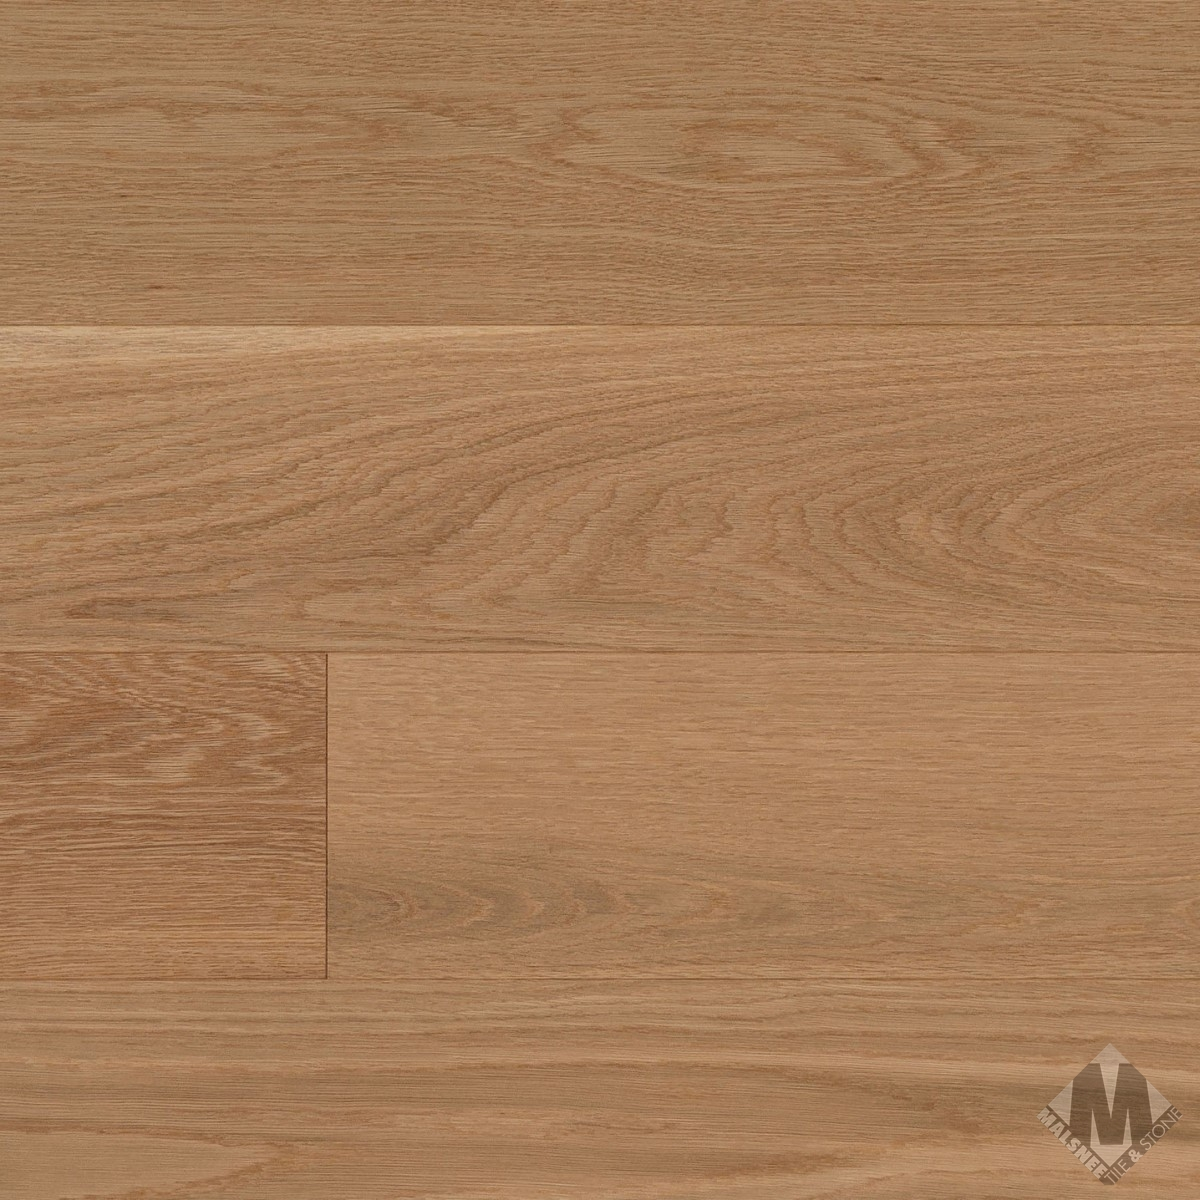 hardwood-flooring-white-oak-exclusive-brushed-2